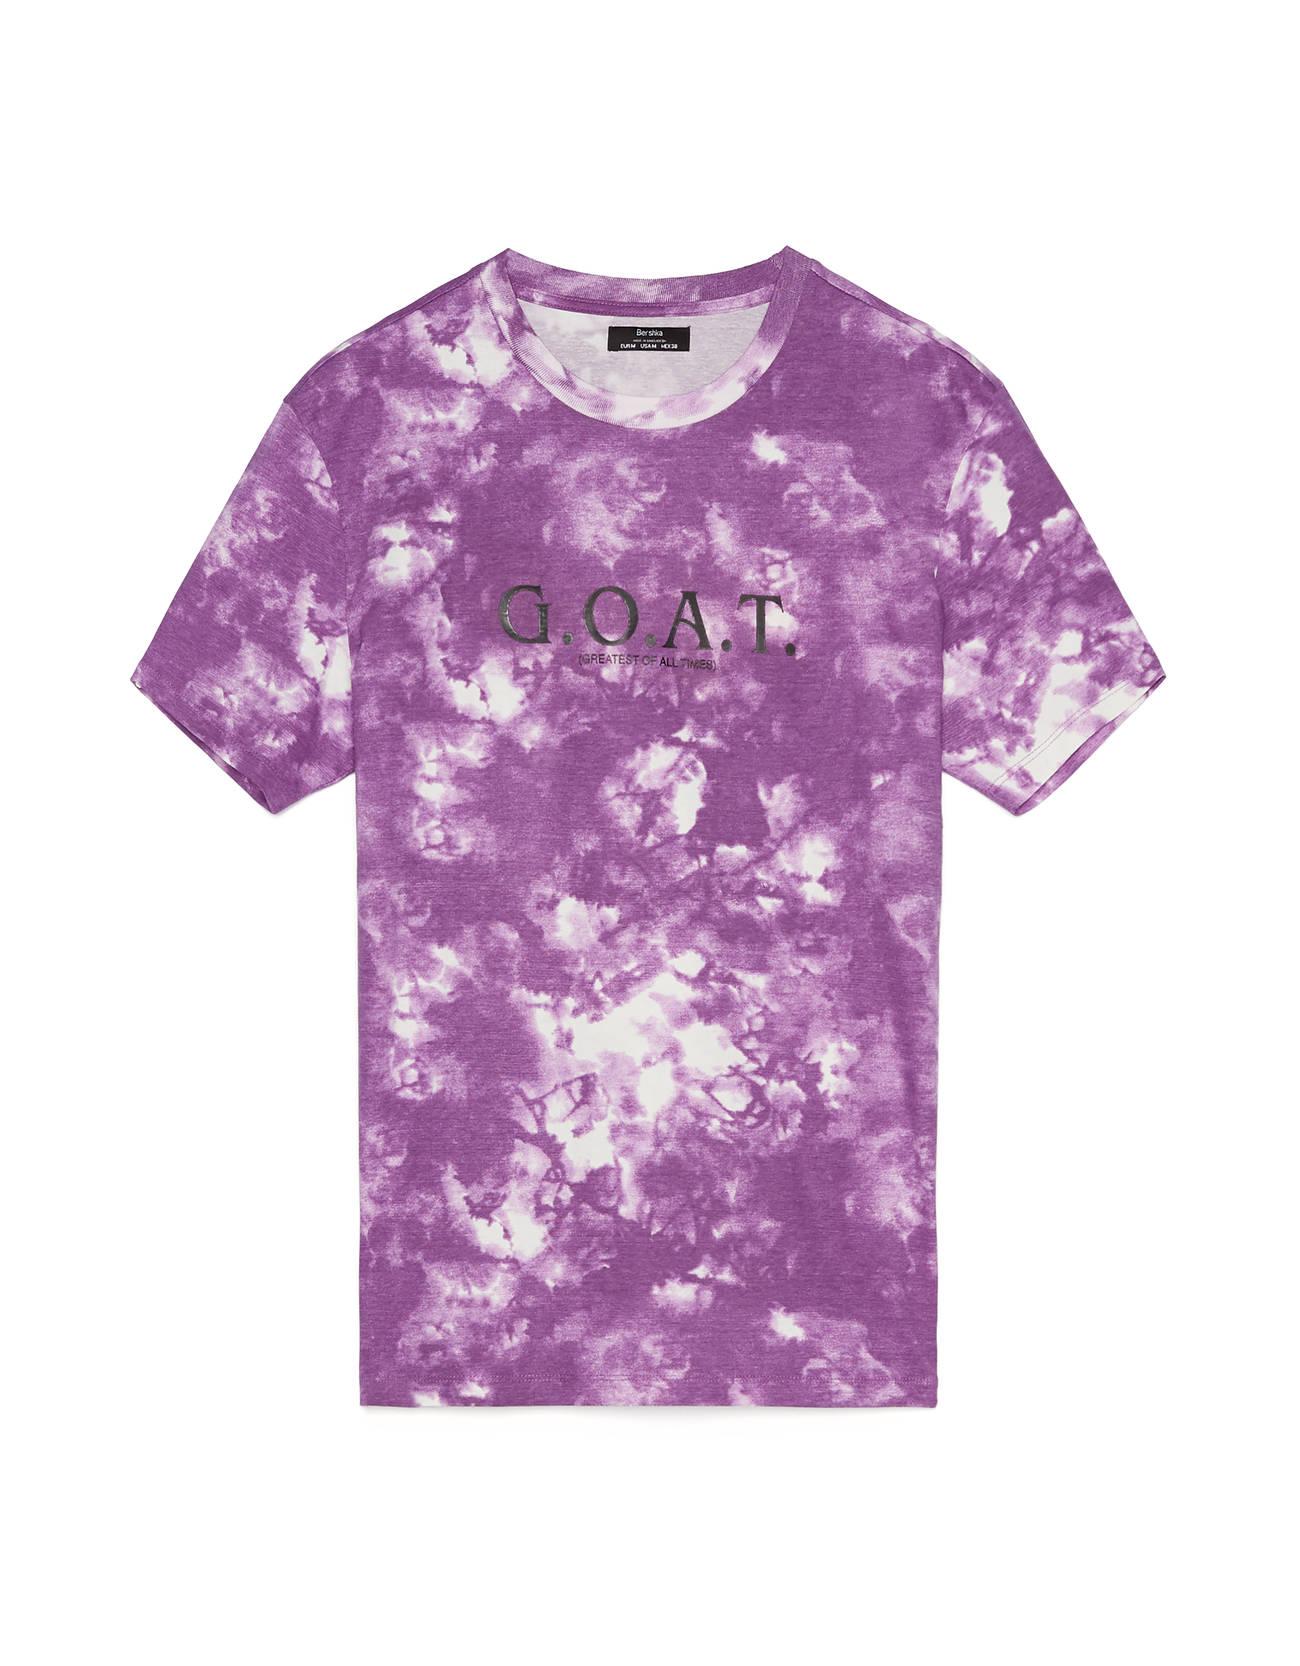 Camiseta tie dye de manga corta